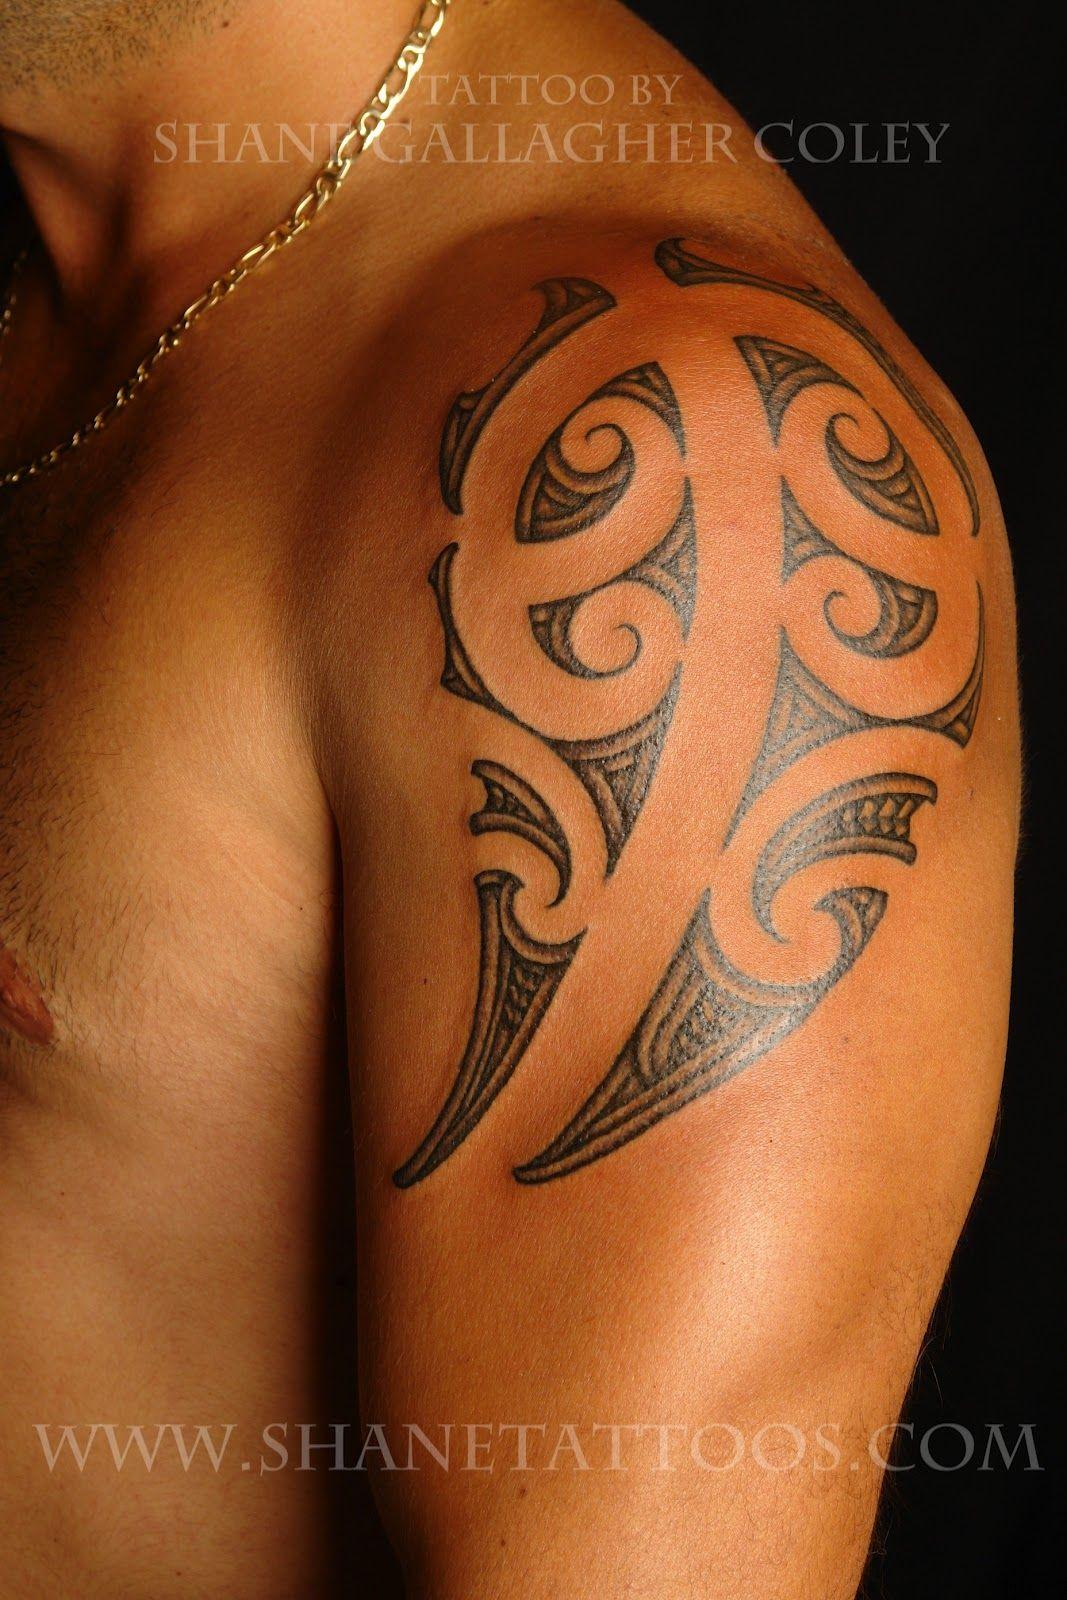 Maori Shoulder Tattoos Shane Tattoos Maori Shoulder Tattoo